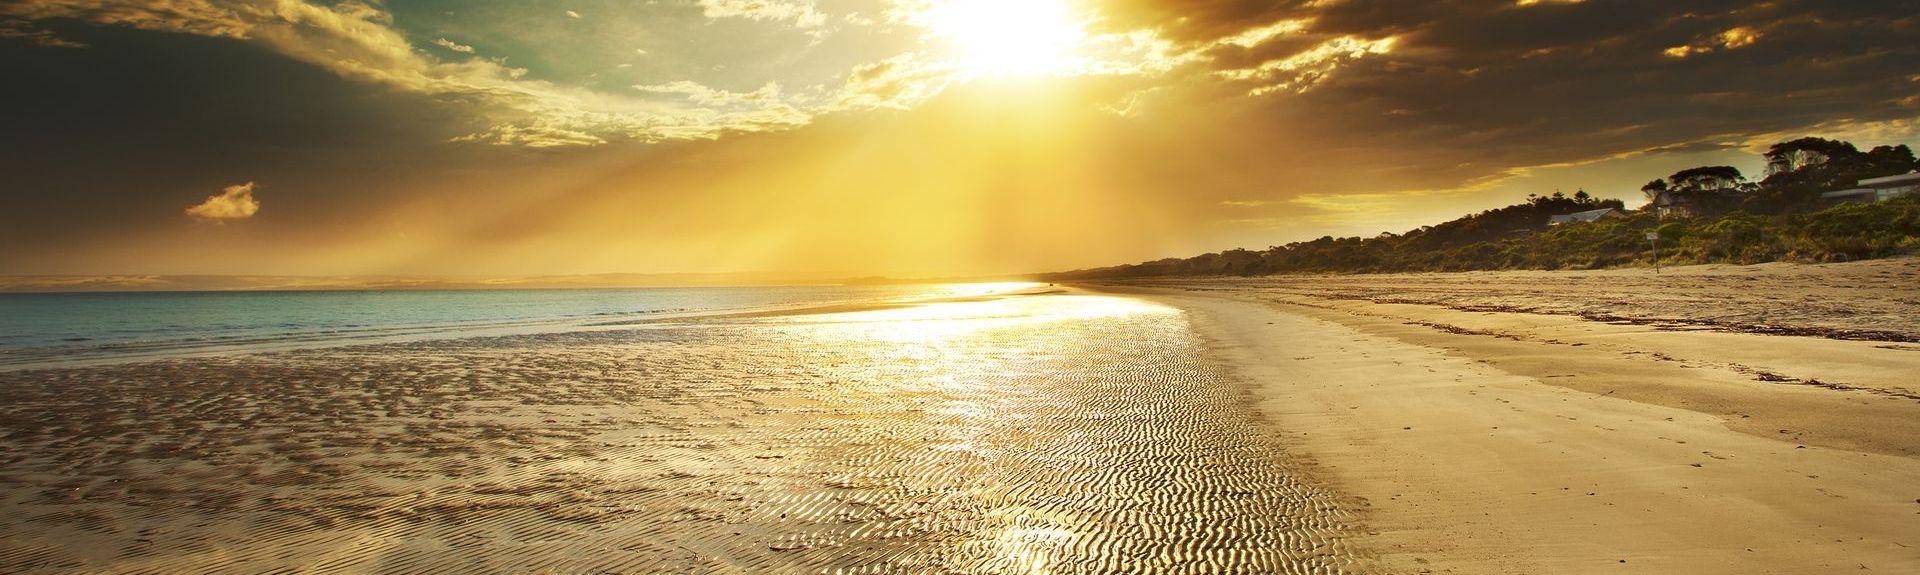 Island Beach, South Australia, Australia